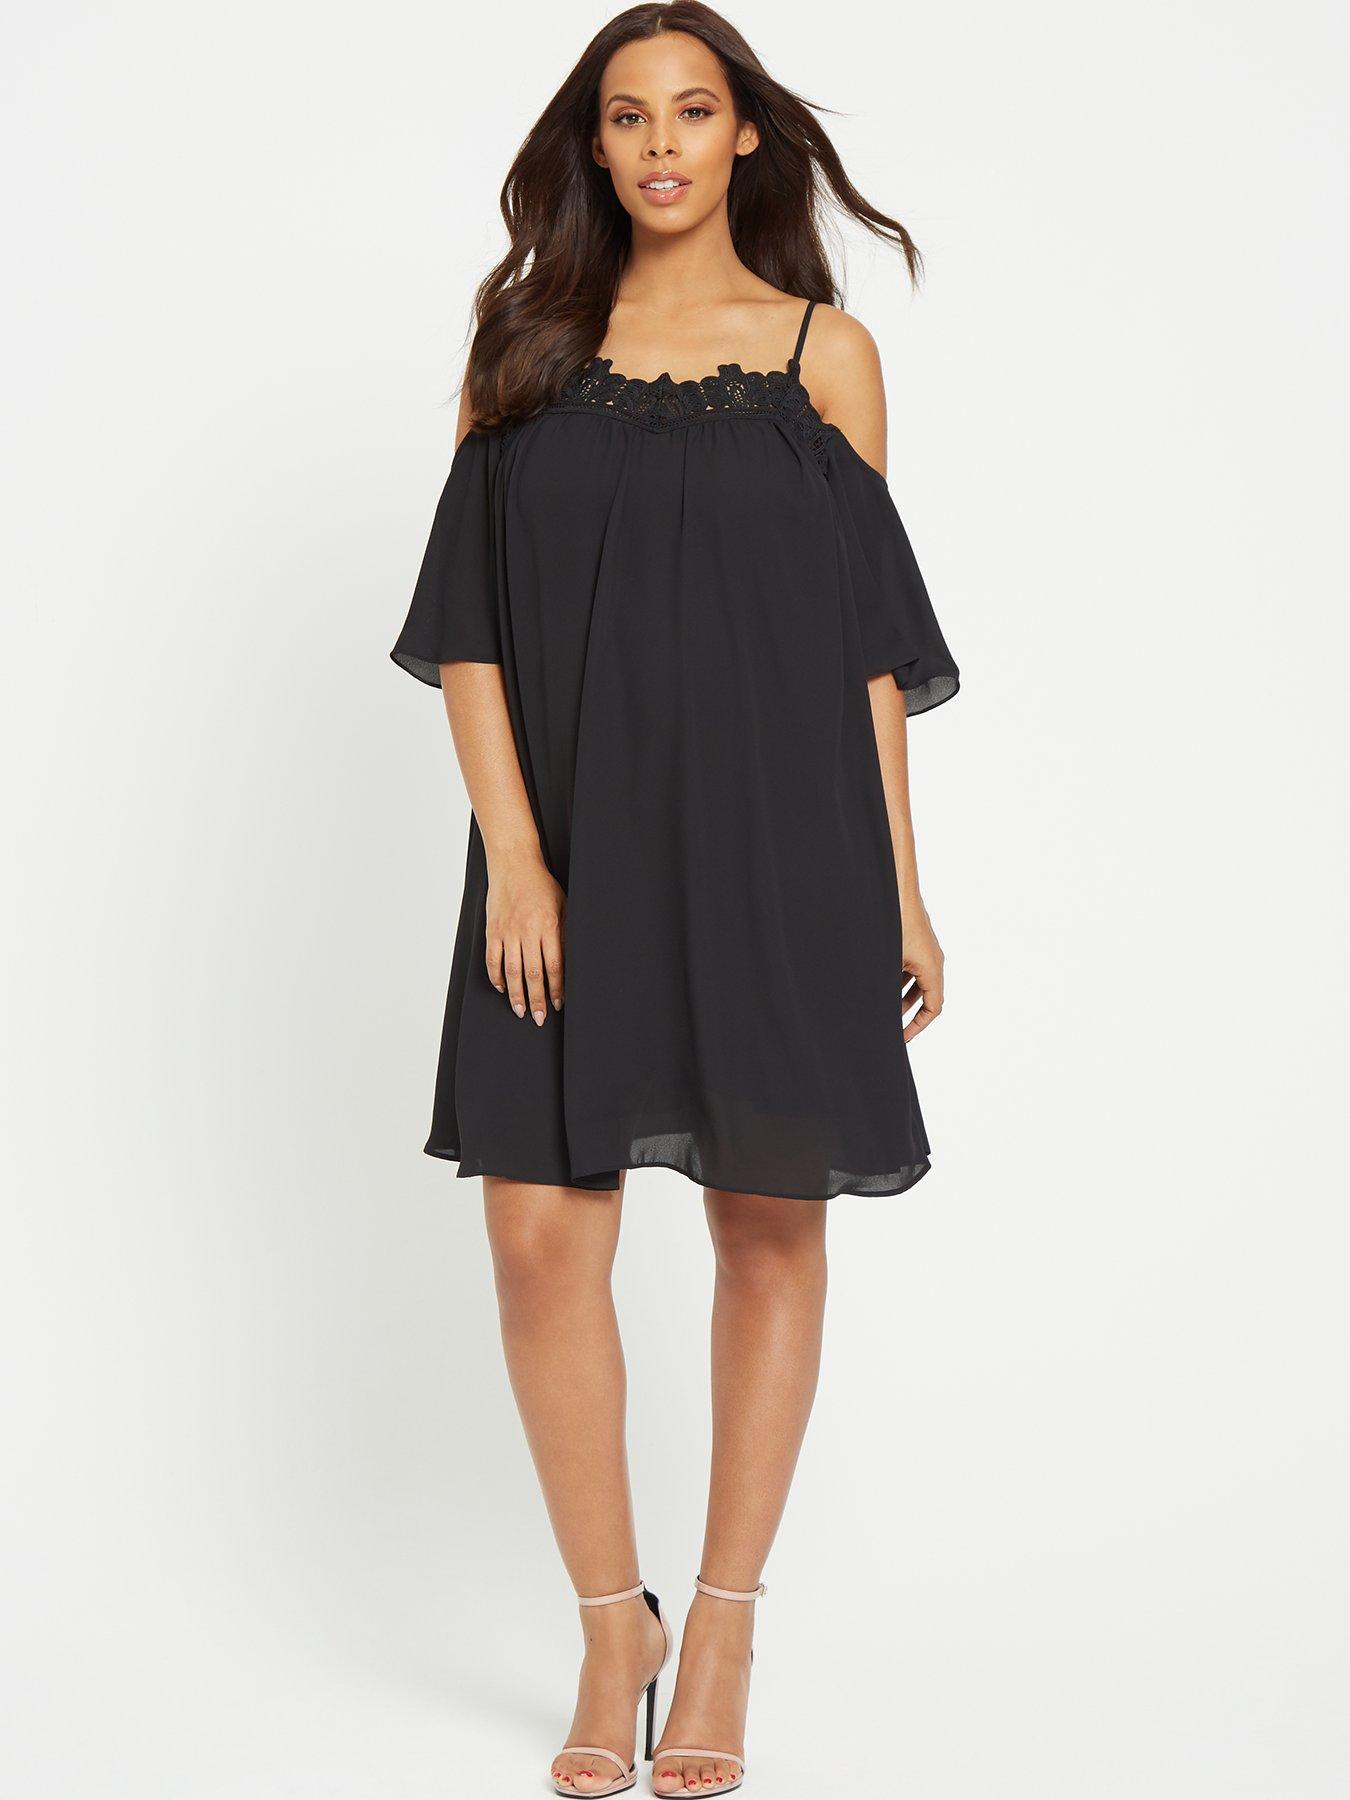 Black dress 12 months maternity